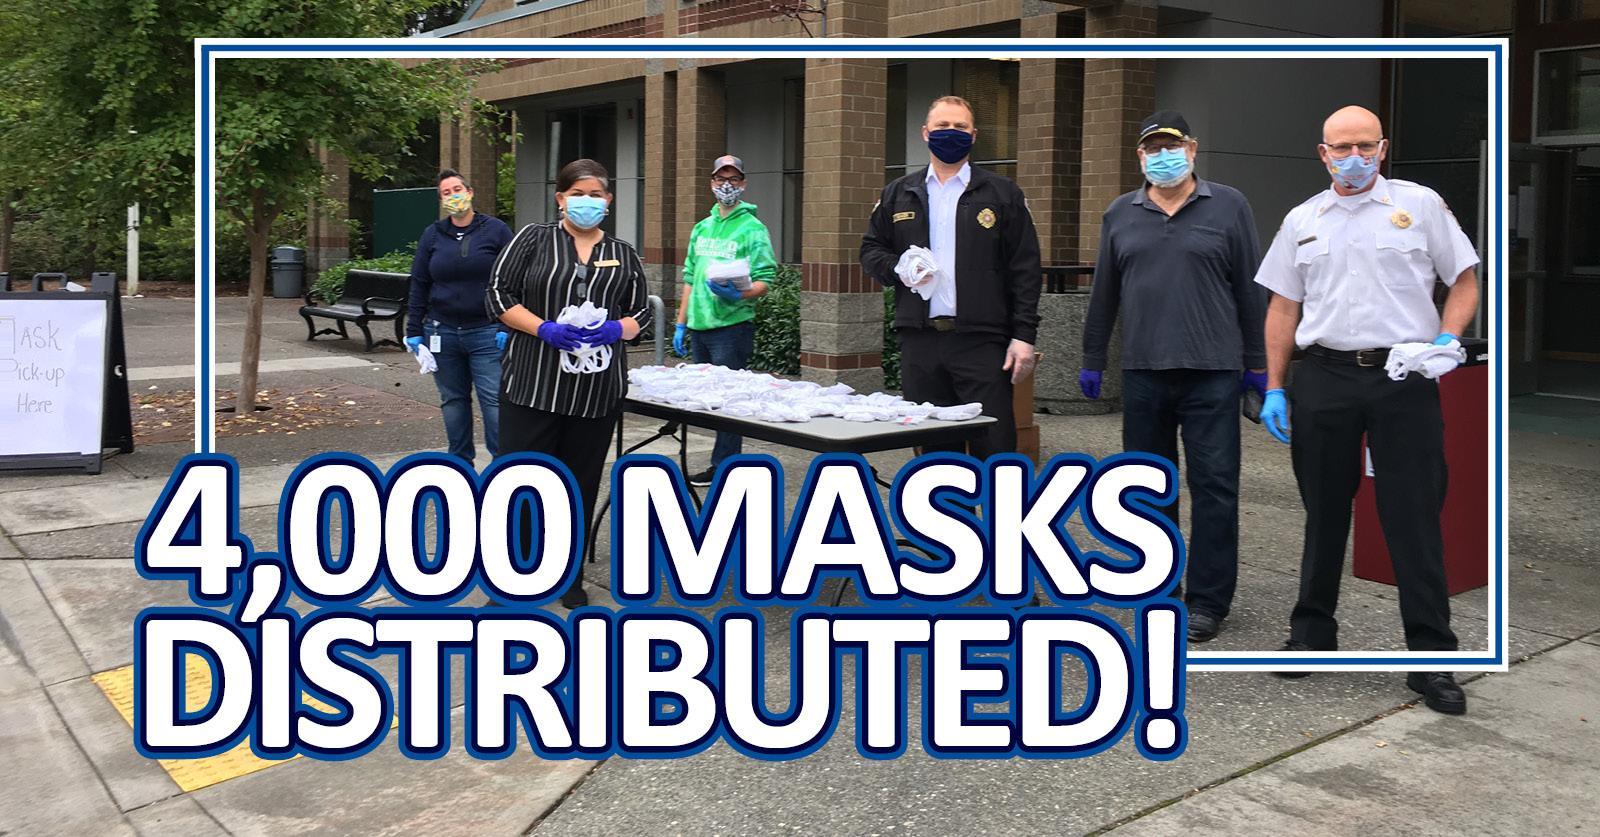 Renton RFA Helps City of Renton Distribute 20,000 Masks